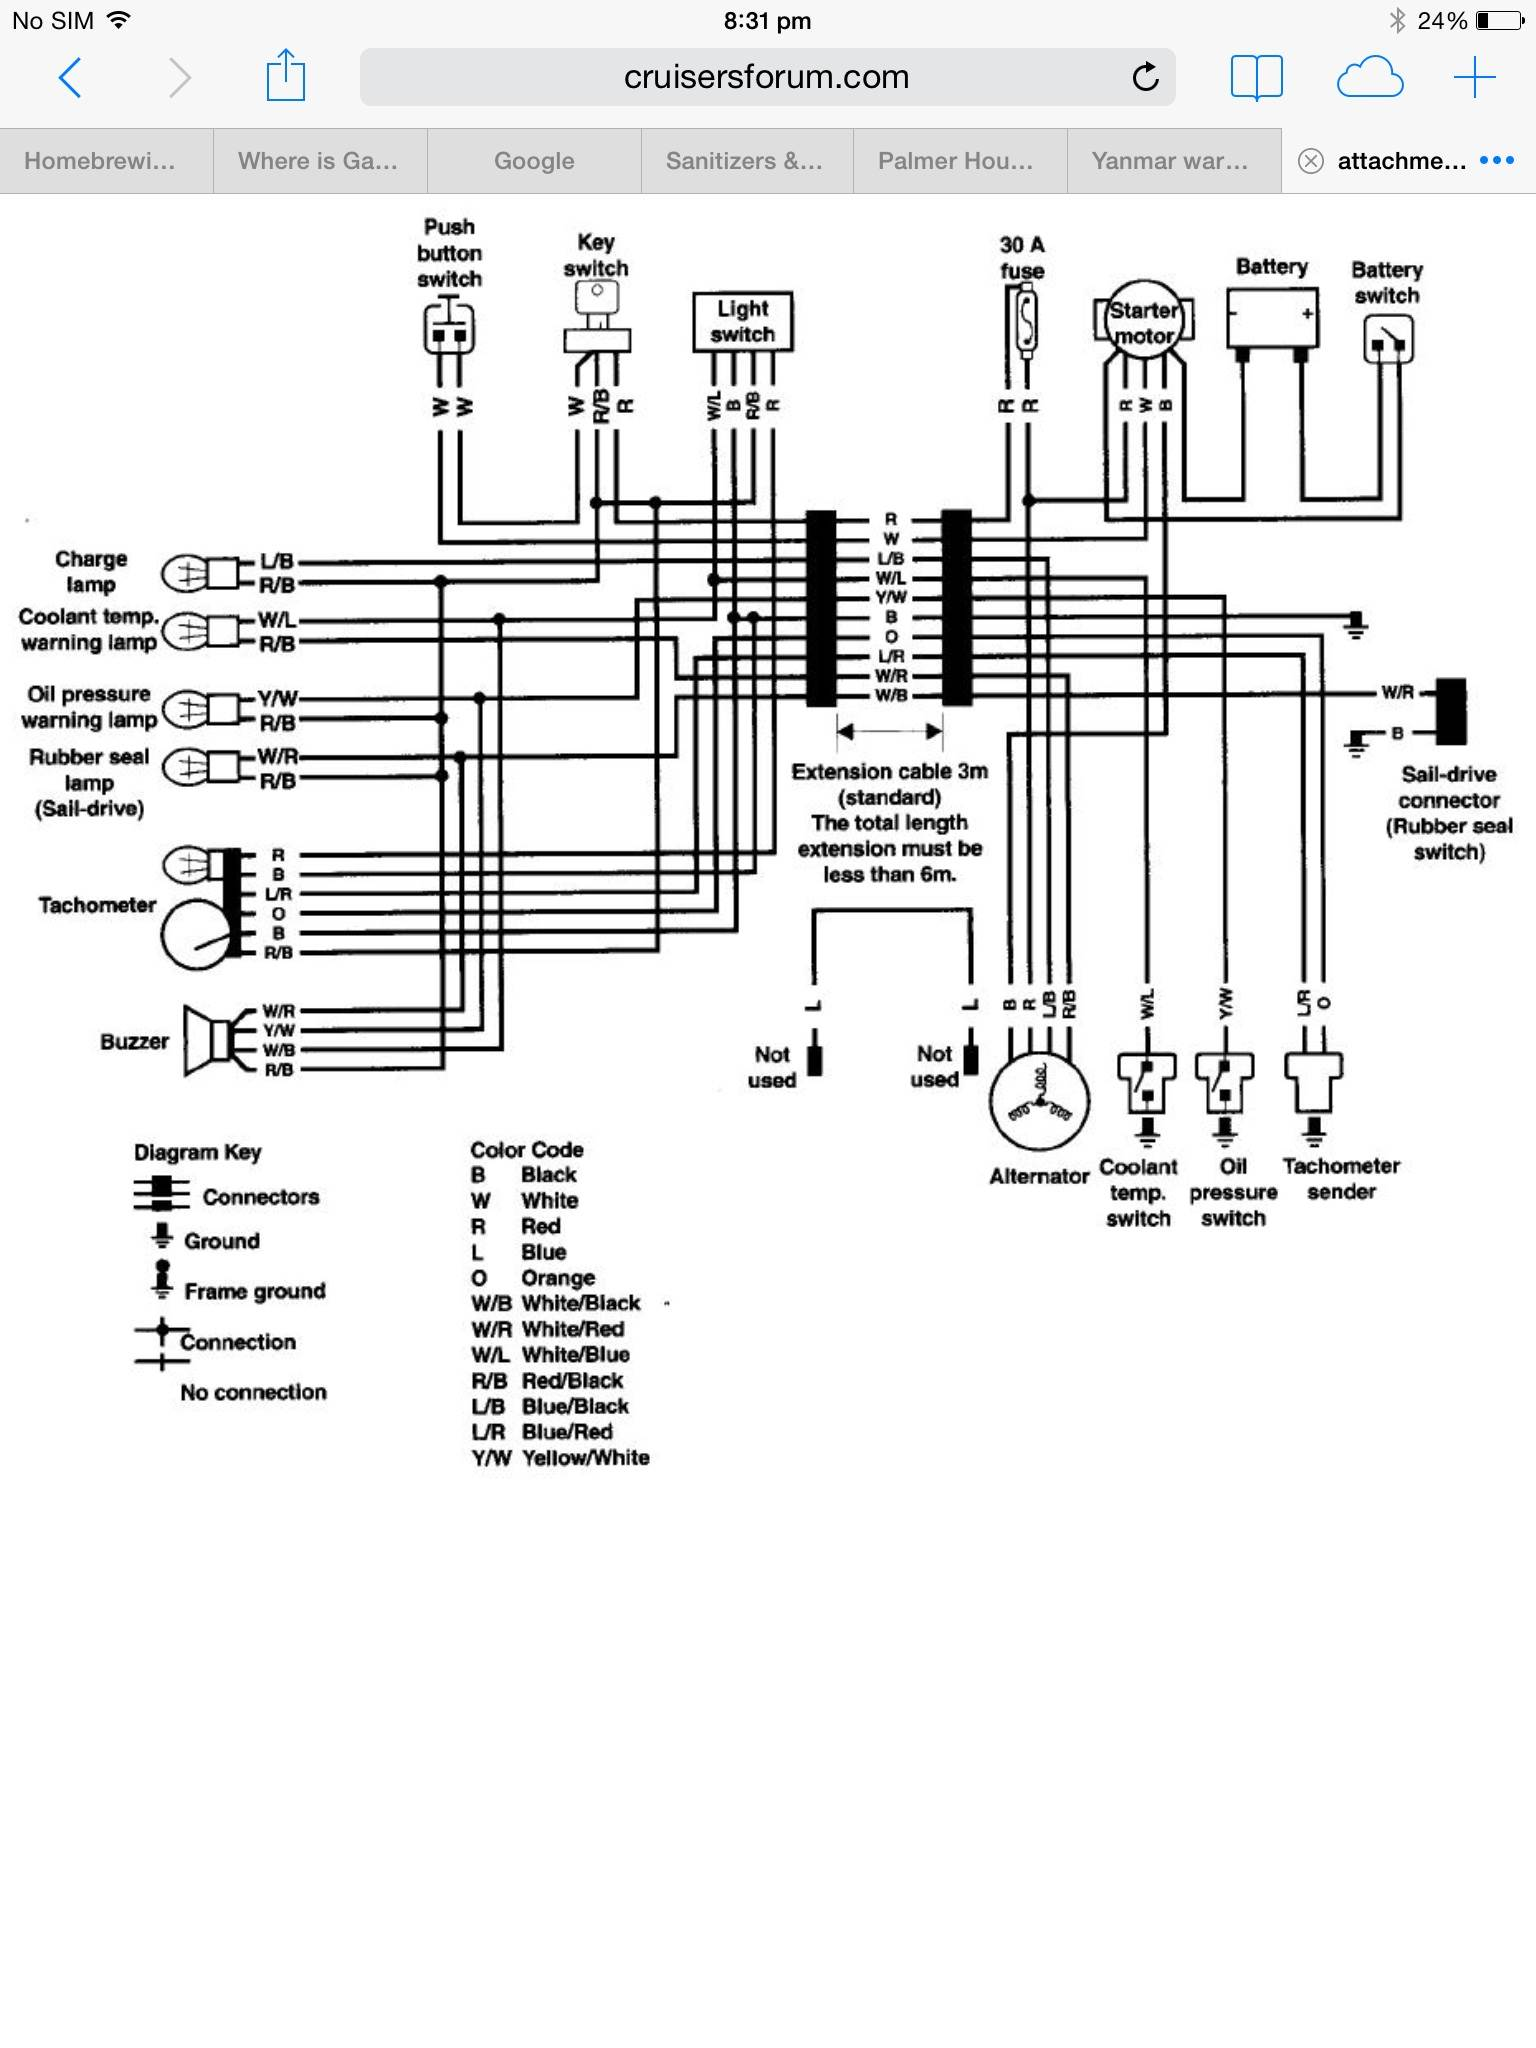 8479024 Yanmar Tachometer Wiring Diagram on yanmar engine diagram, ignition switch diagram, yanmar generator, yanmar ym2200 parts, yanmar starter, yanmar 3gm30f parts diagram, yanmar parts catalog, yanmar tractor, yanmar voltage regulator, yanmar alternator wiring, yanmar parts breakdown, diagram of a molded case switch diagram, yanmar wire harness, yanmar fuel pump diagram,